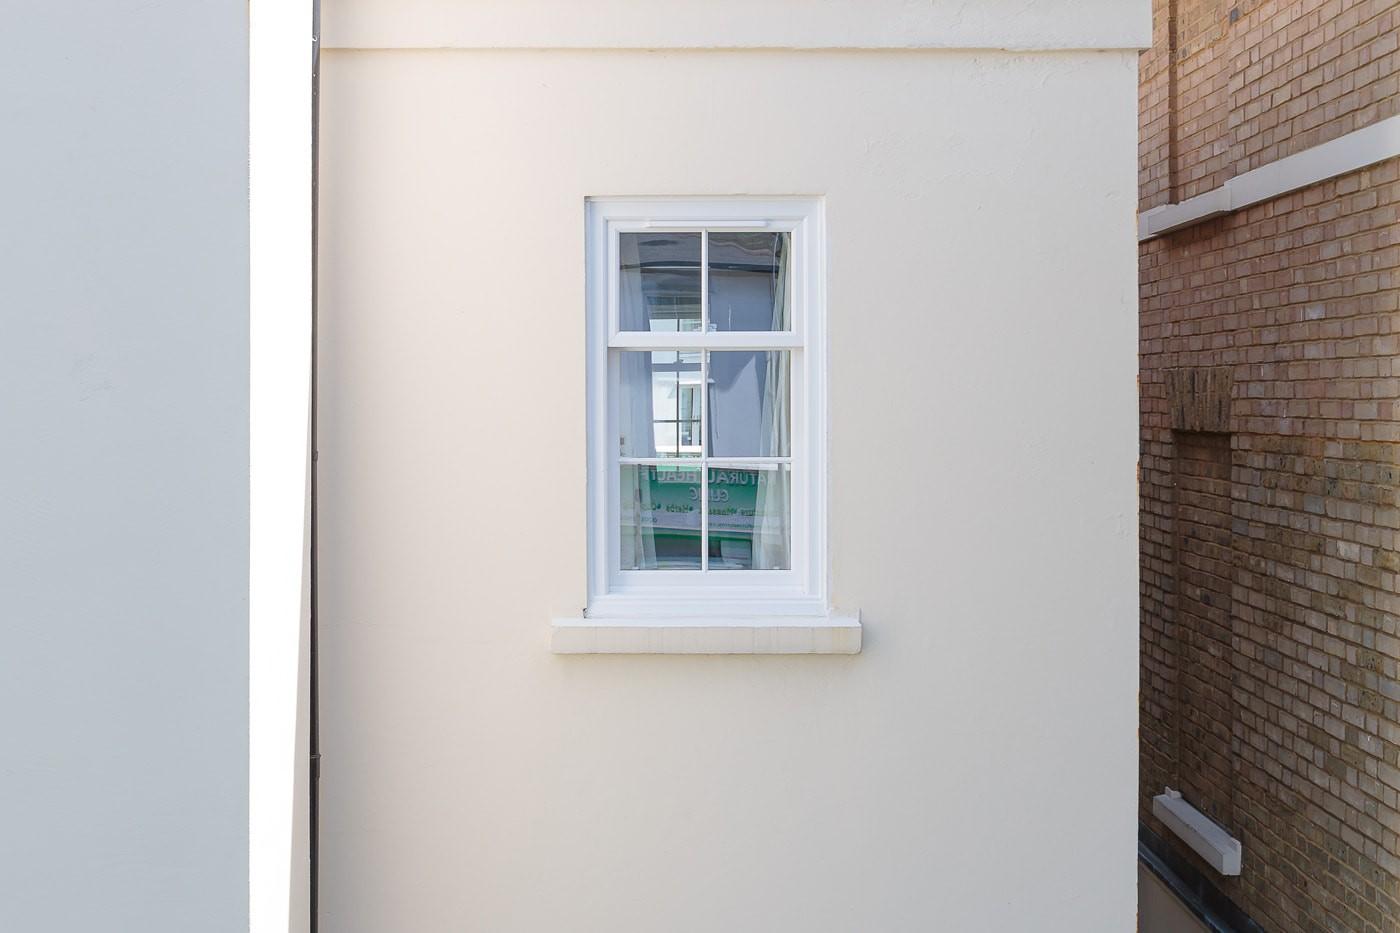 New sash windows installed in Surbiton from Hamiltons